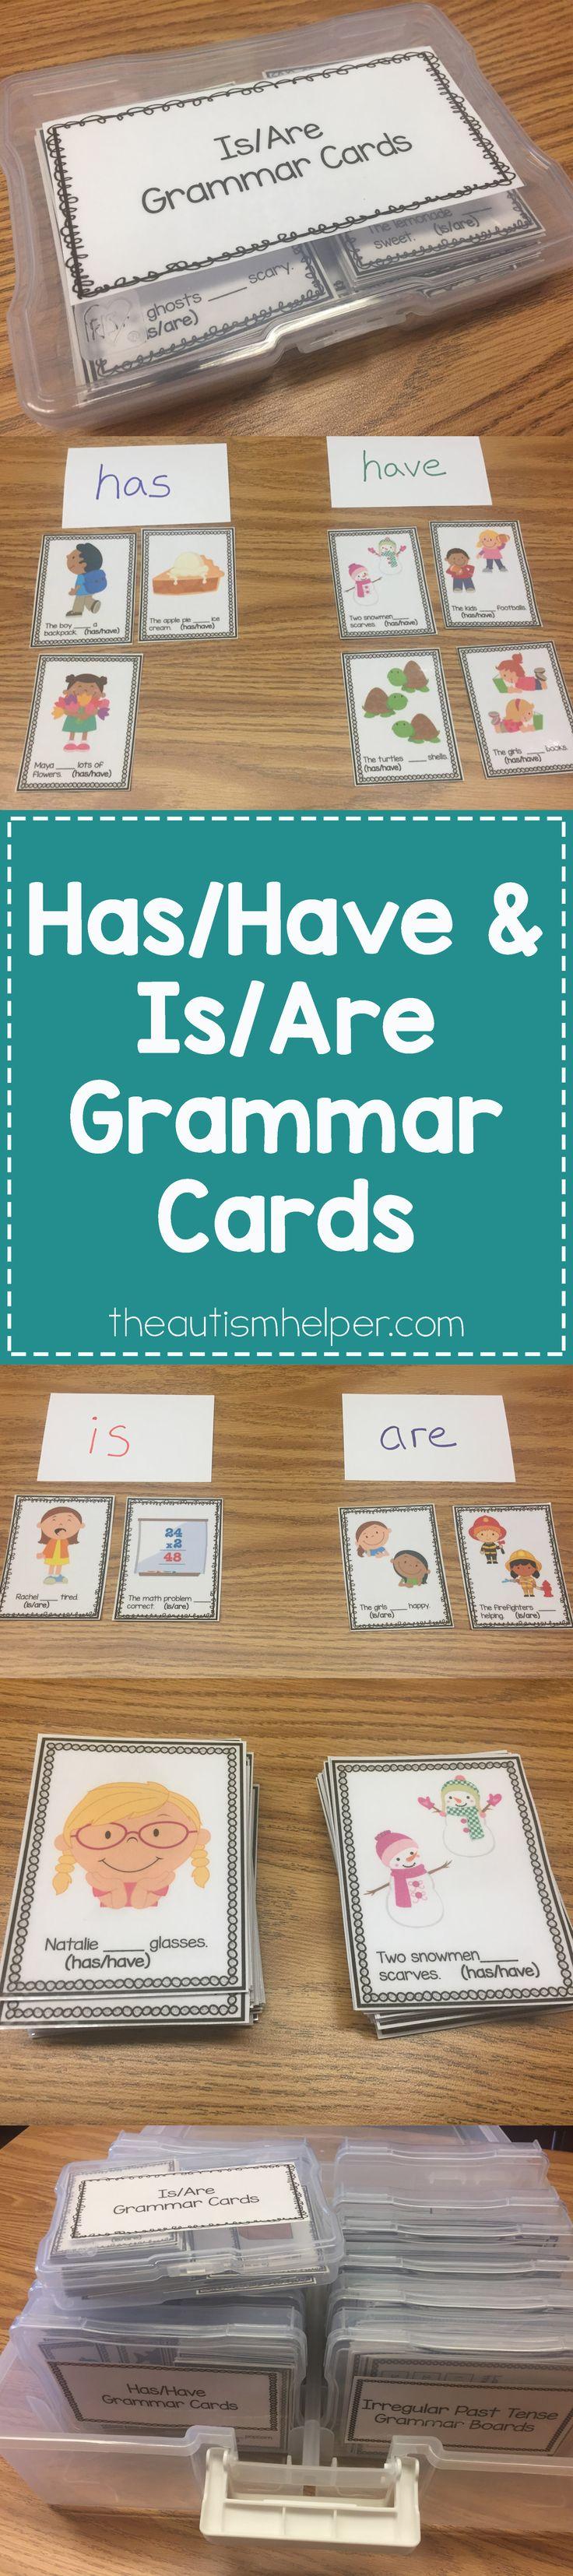 82 best Grammar Activities images on Pinterest | Speech language ...